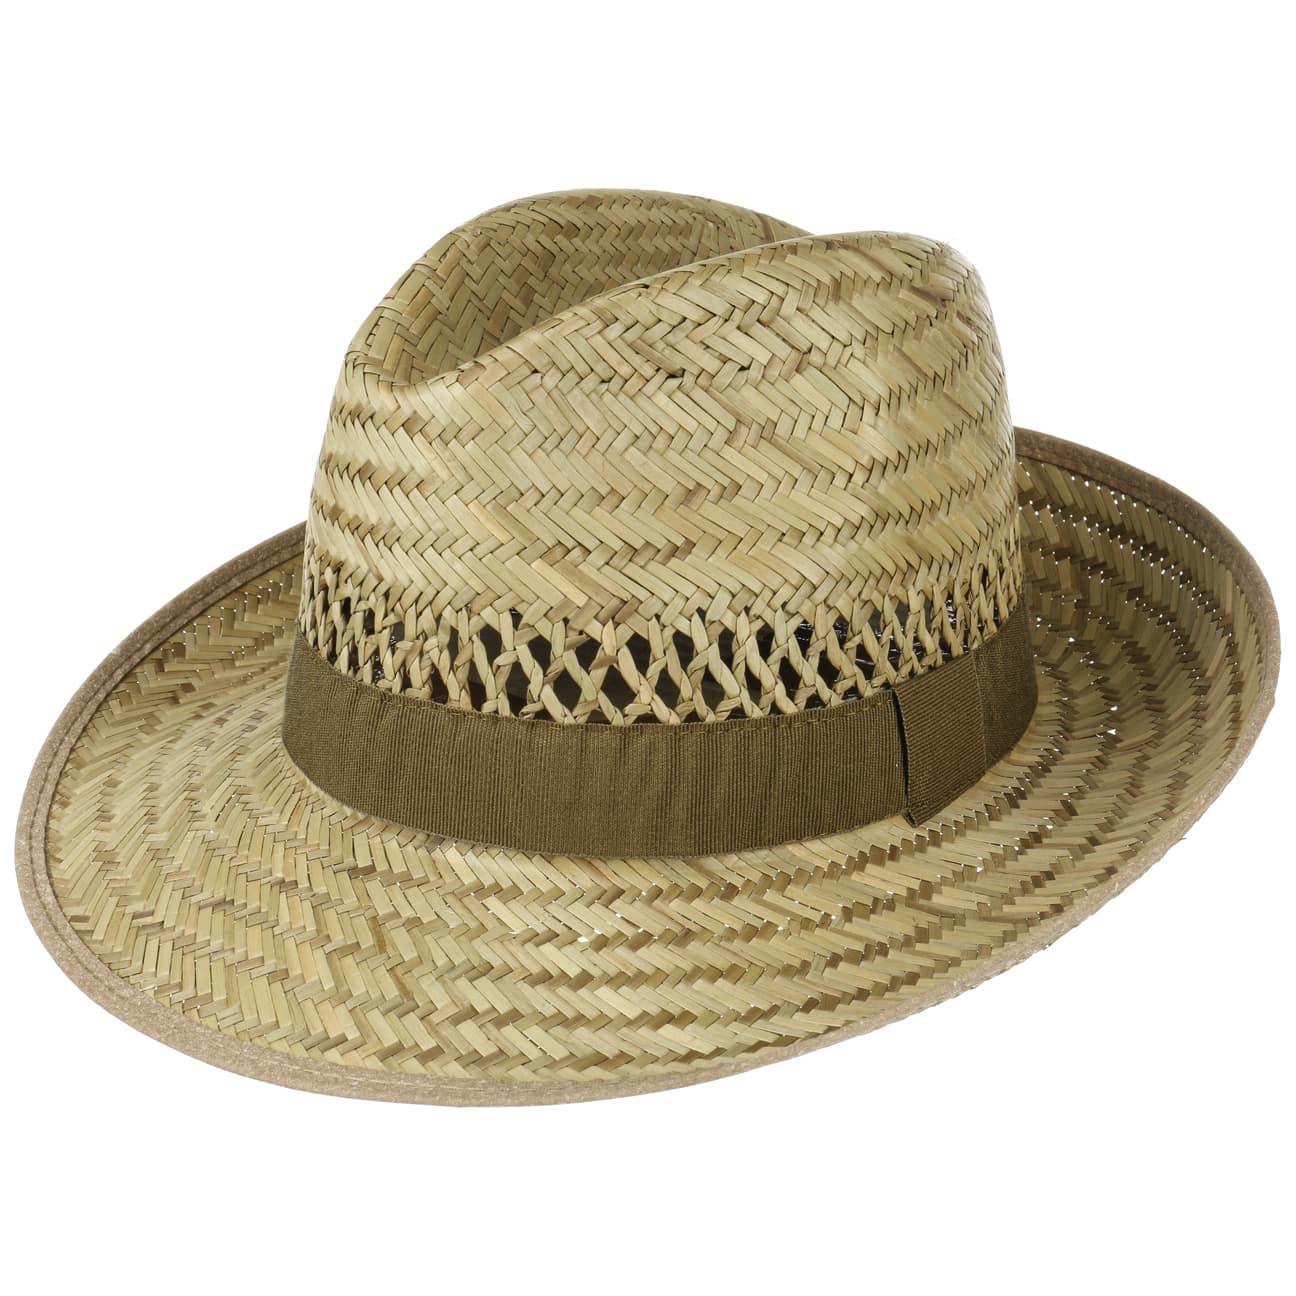 Sombrero Acci?n de Gracias  sombrero bogart de paja